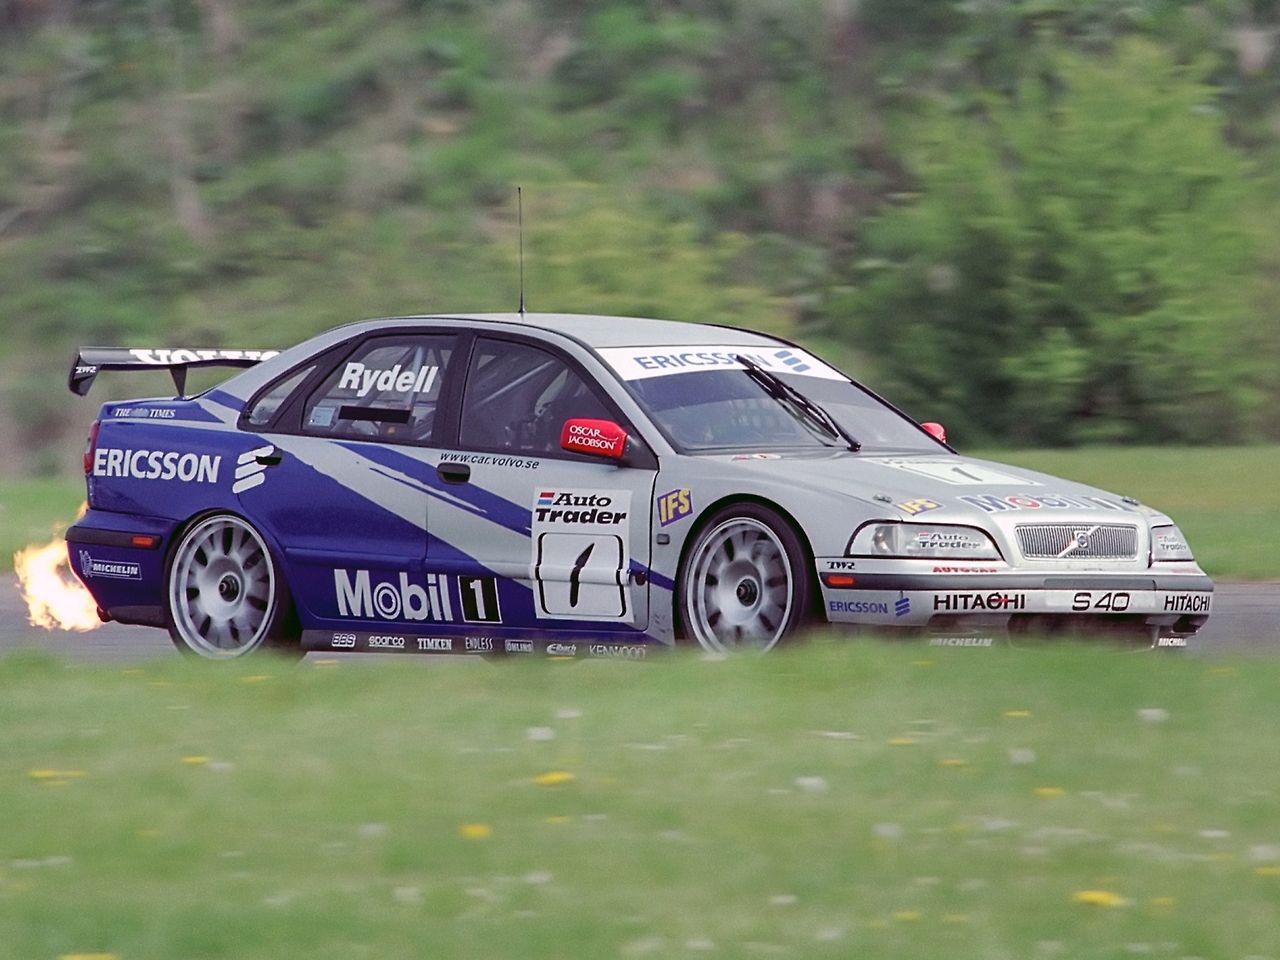 Volvo Race Car Race Action Shots Pinterest Volvo